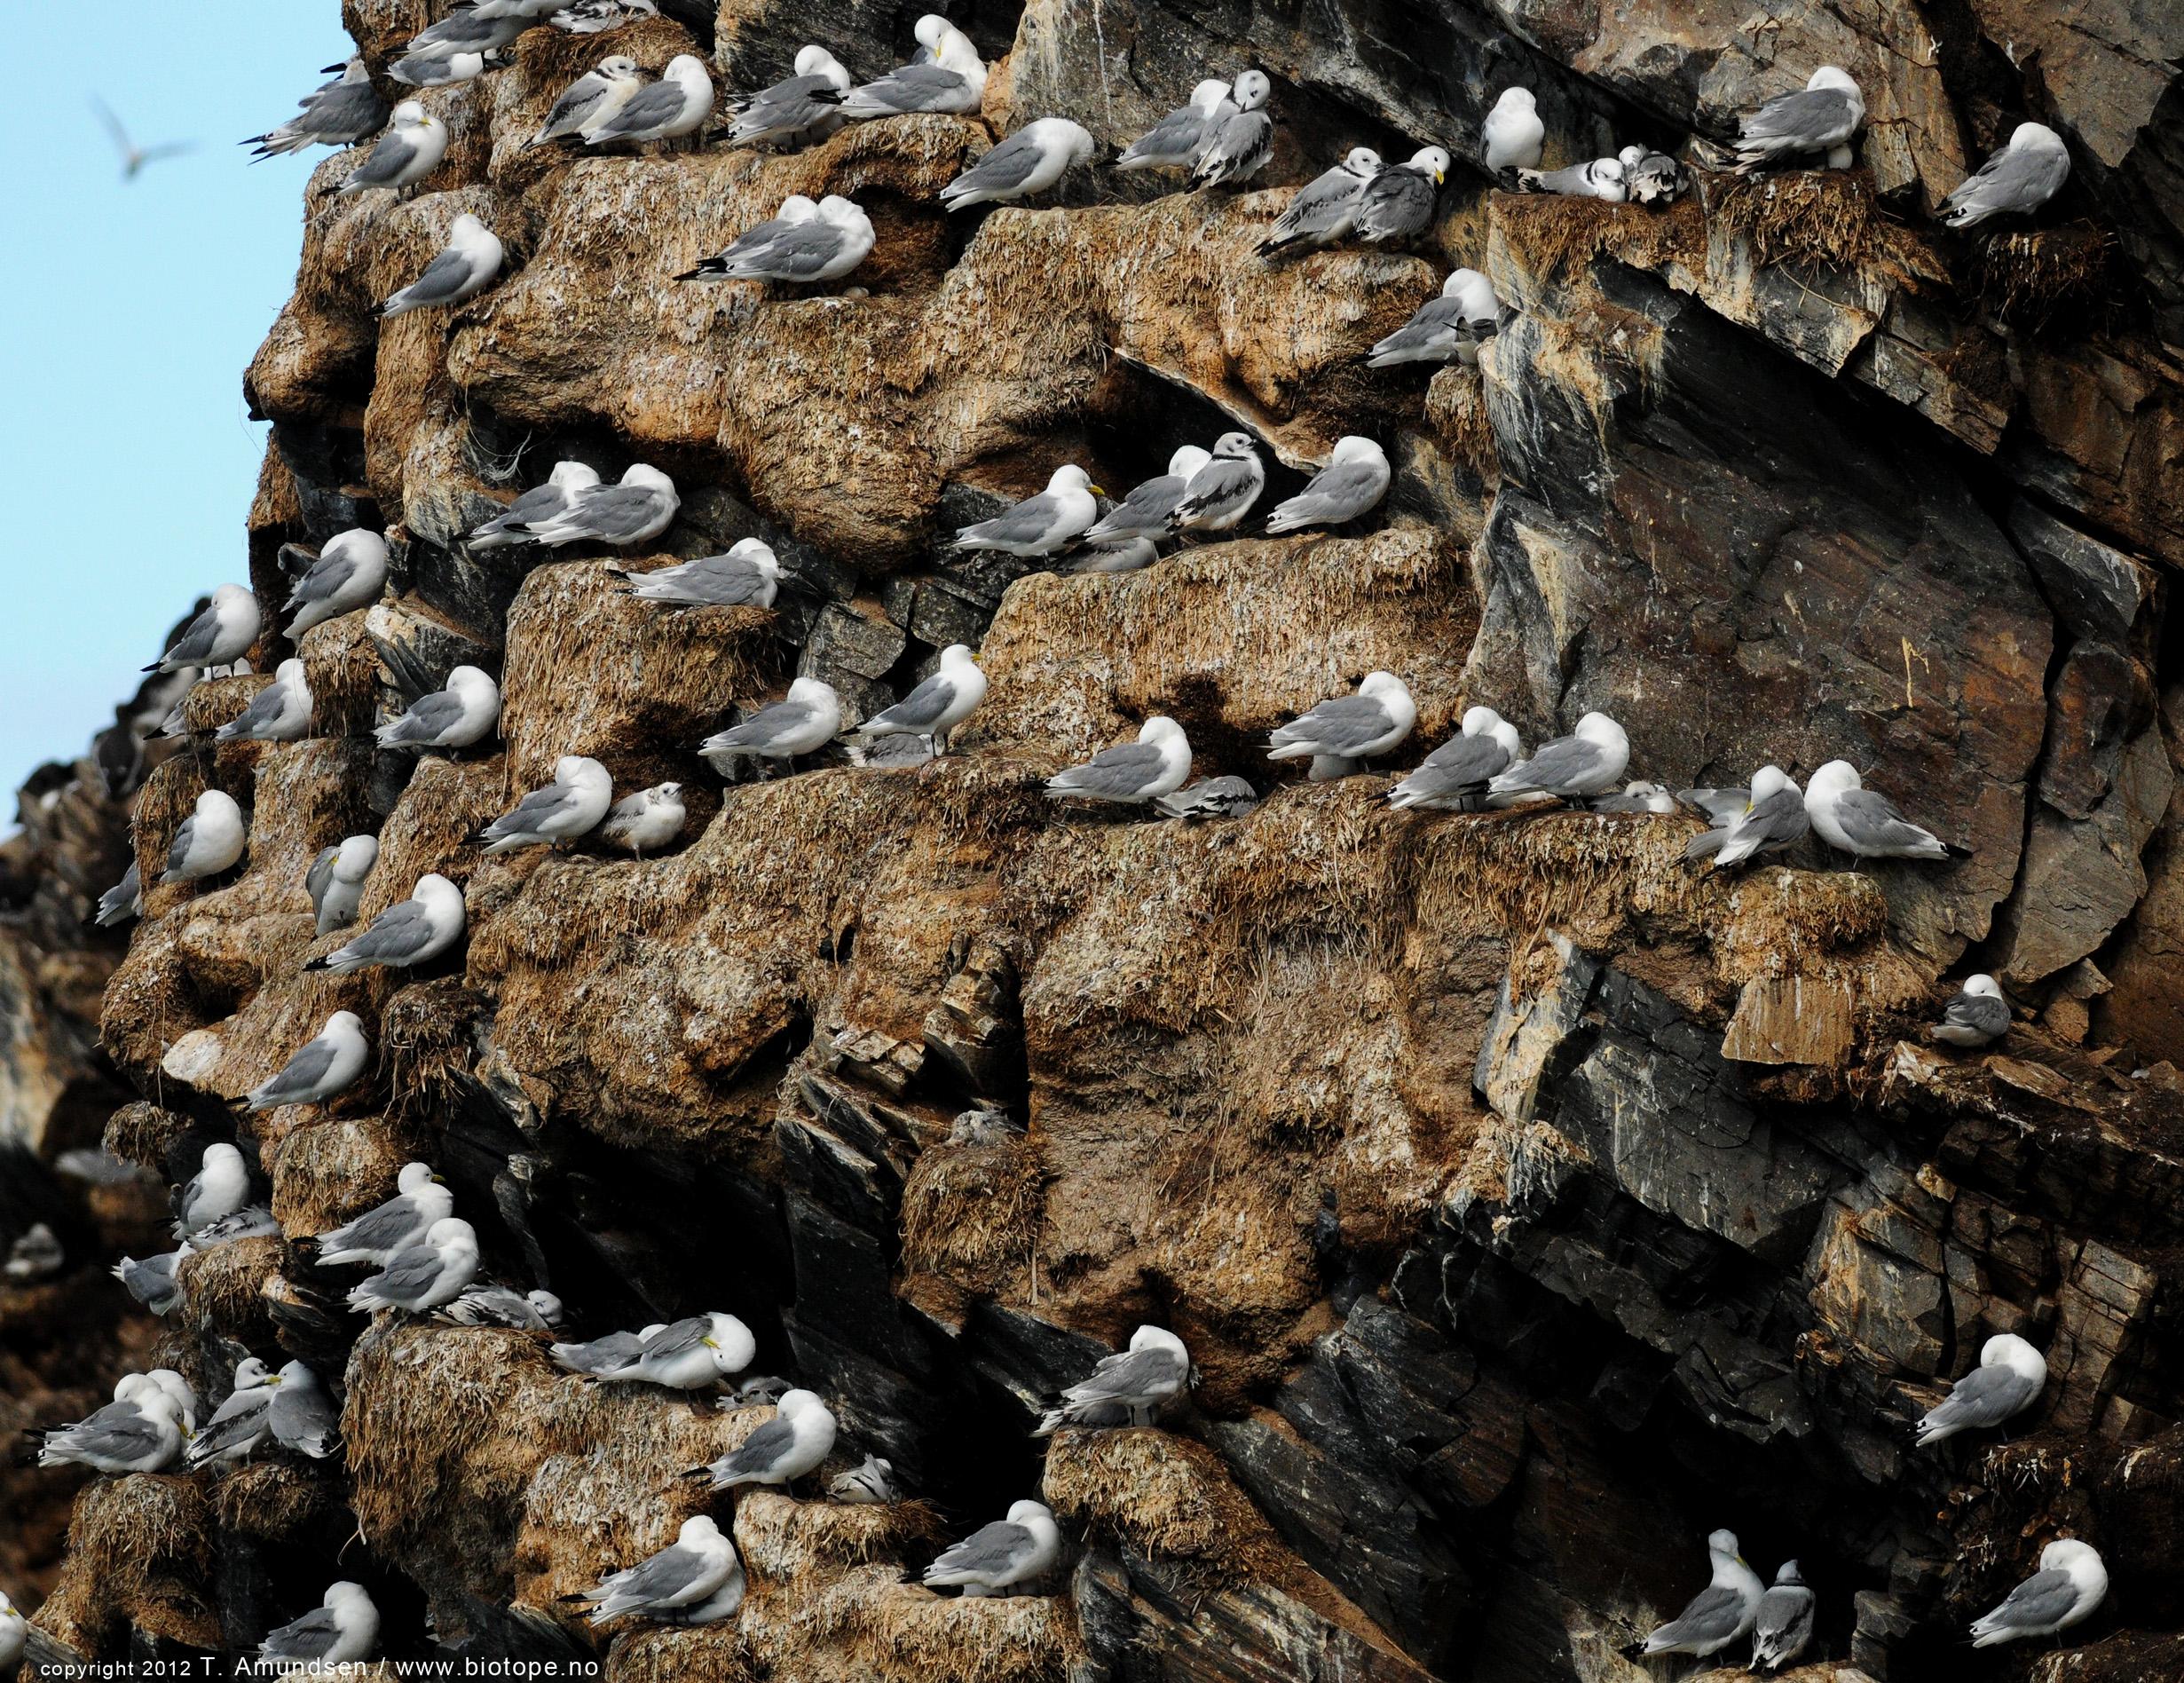 Bird Cliff of Ekkerøy